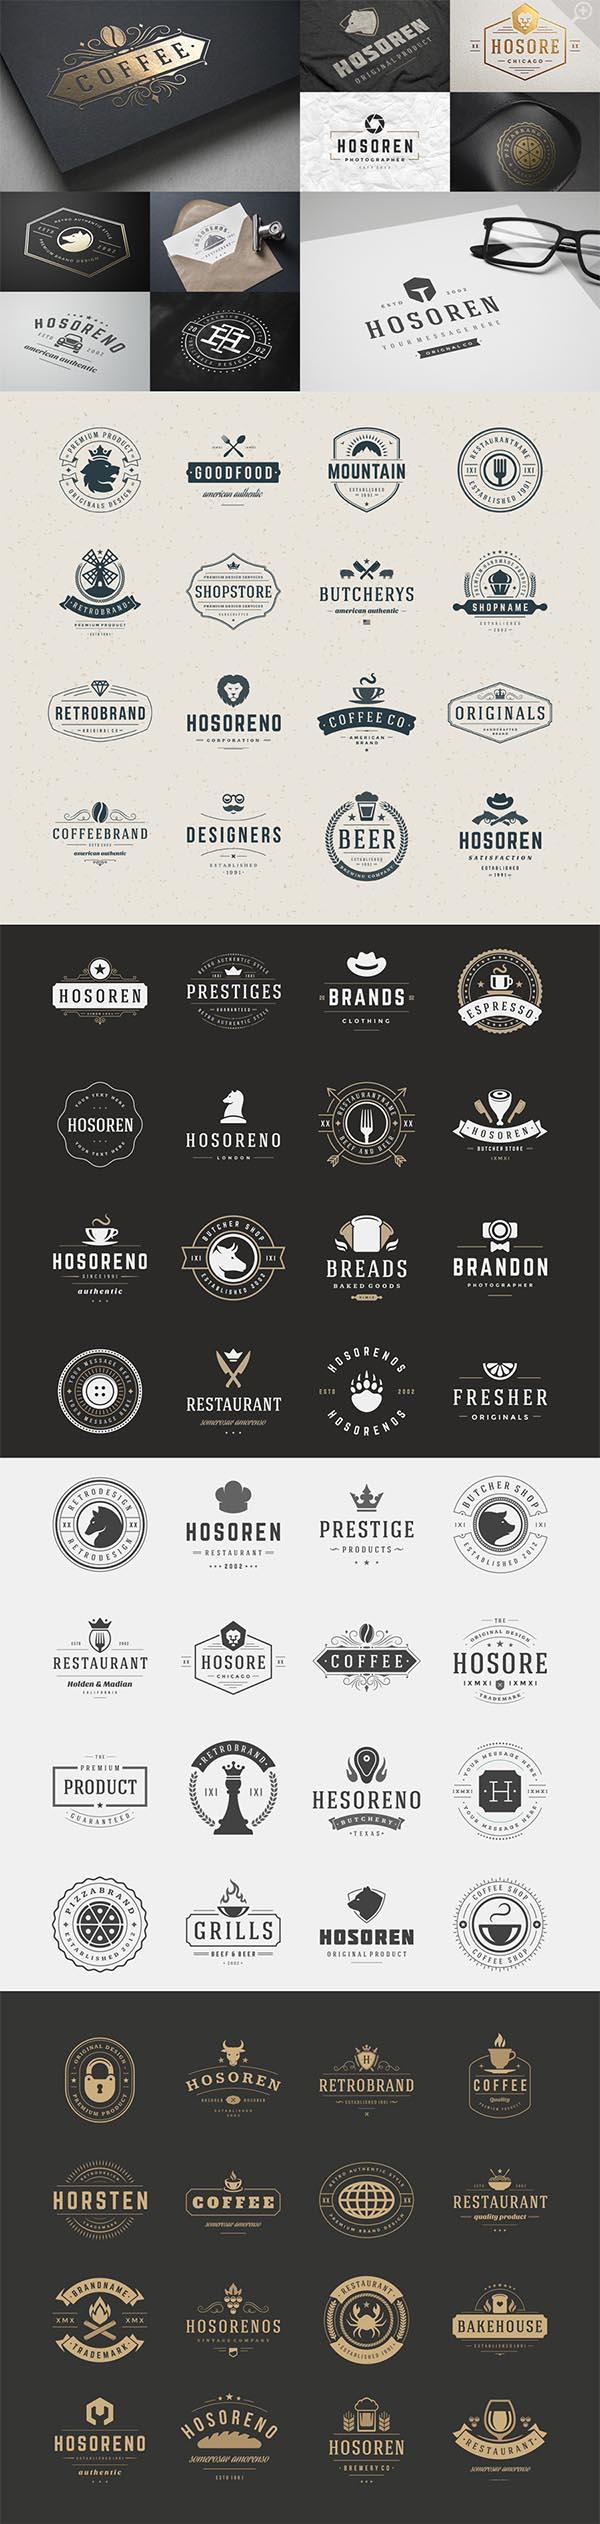 700 Retro Vintage Logotypes and Badges - 1